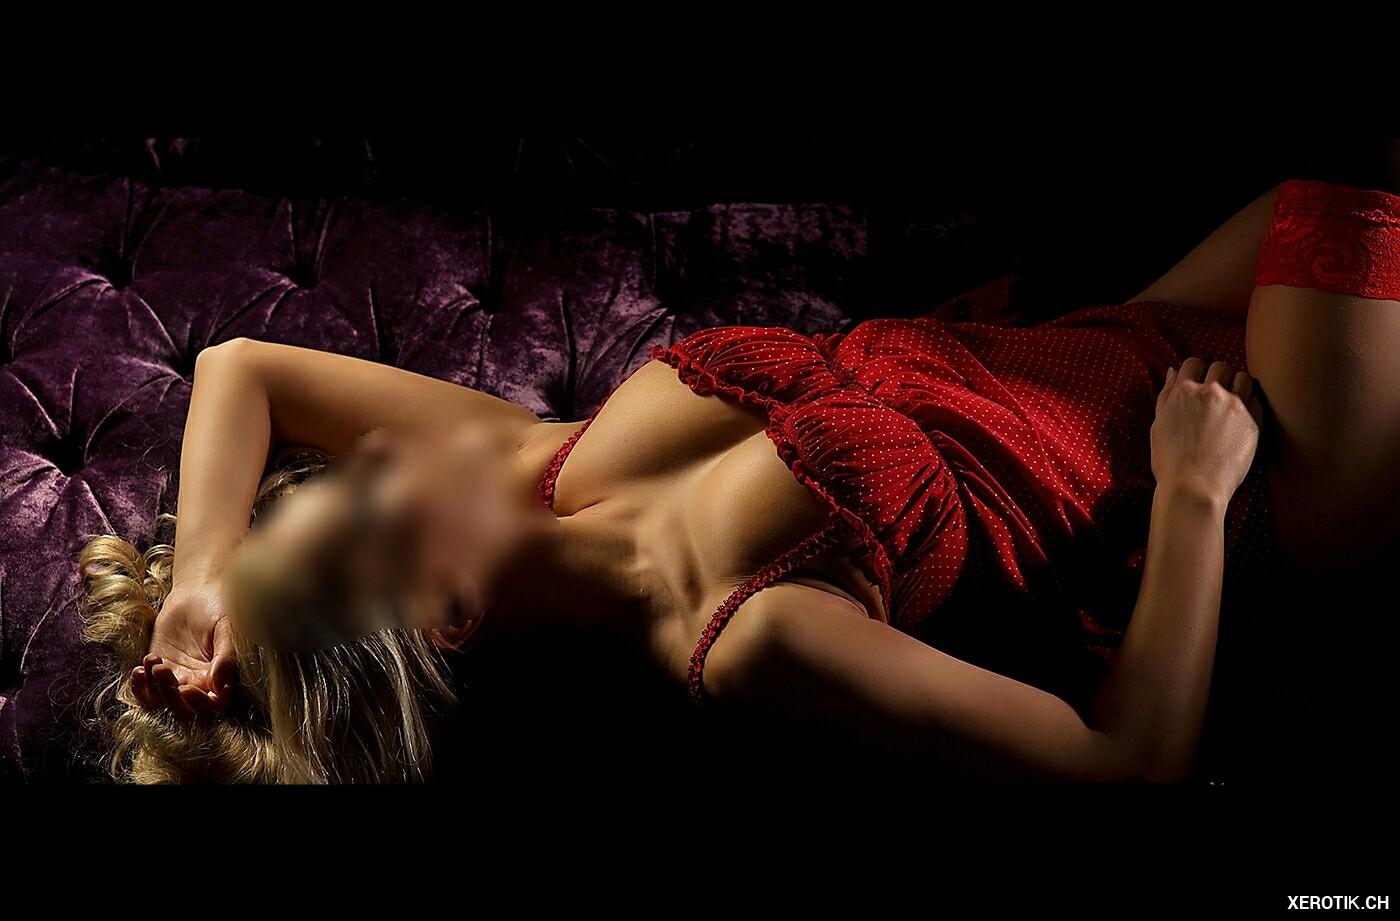 Erotik inserate NEW sexy Masseurin in Luzern